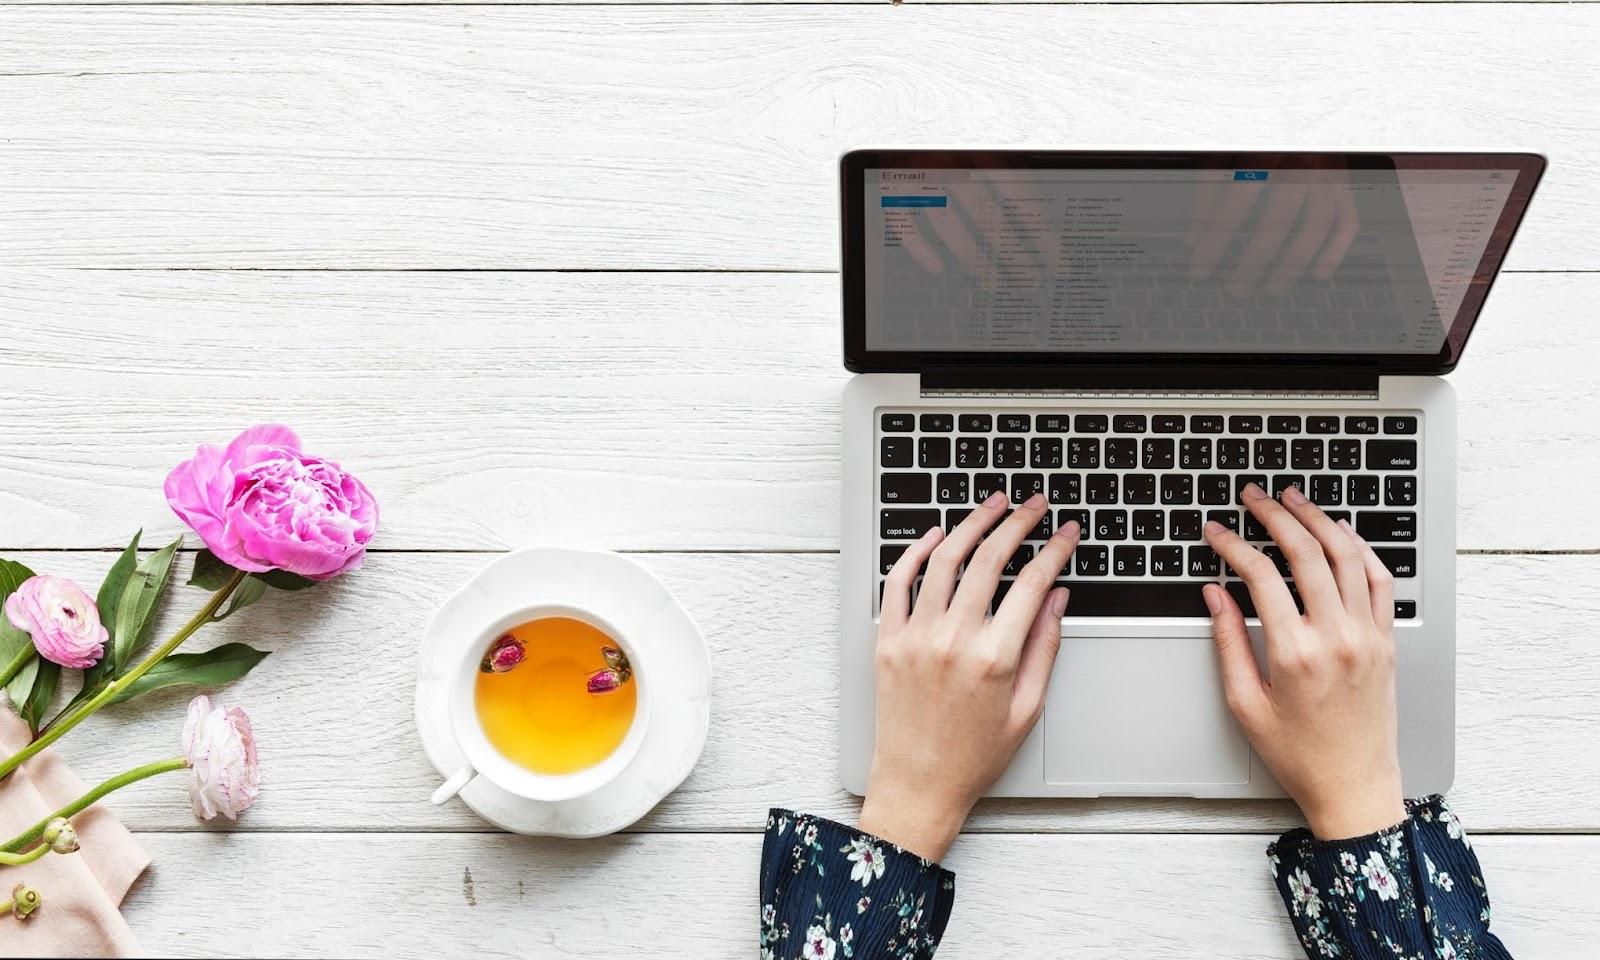 Why I set up LDN Laptop Club